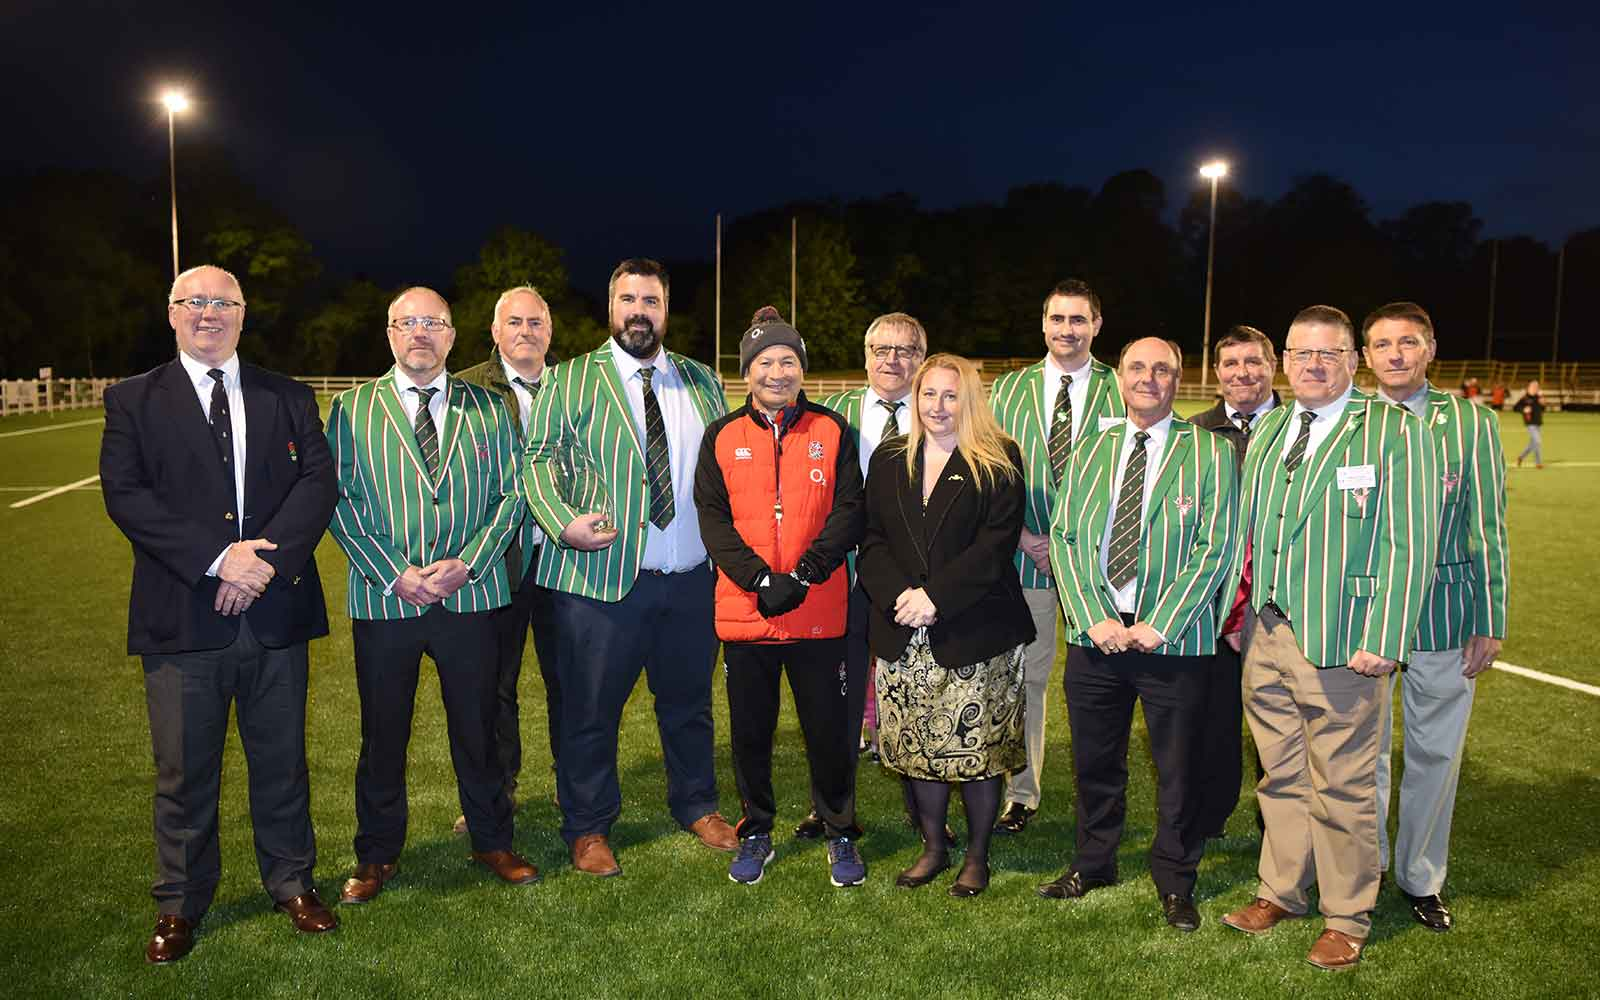 Eddie Jones at Cheshunt Rugby Club